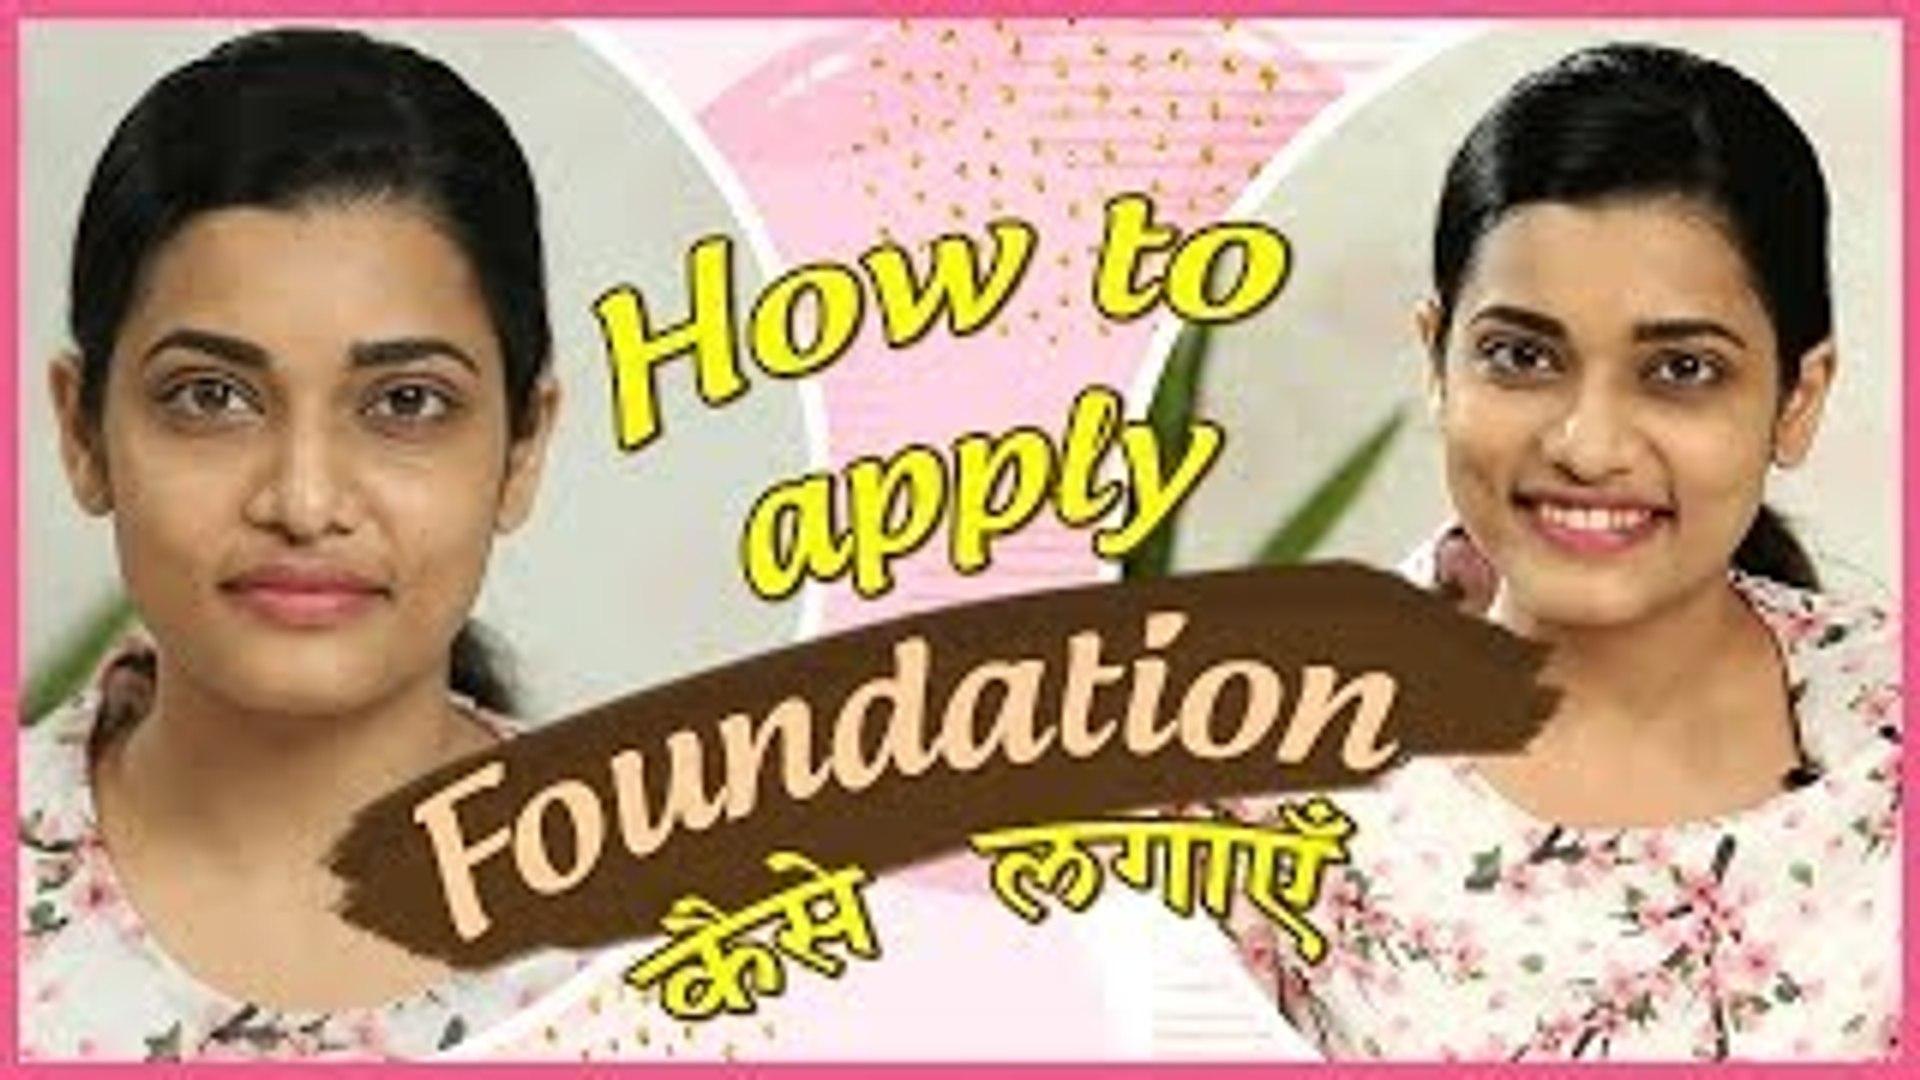 How To Apply Foundation | Beauty Video In Hindi | Foundation कैसे लगाएं | Beginners Video